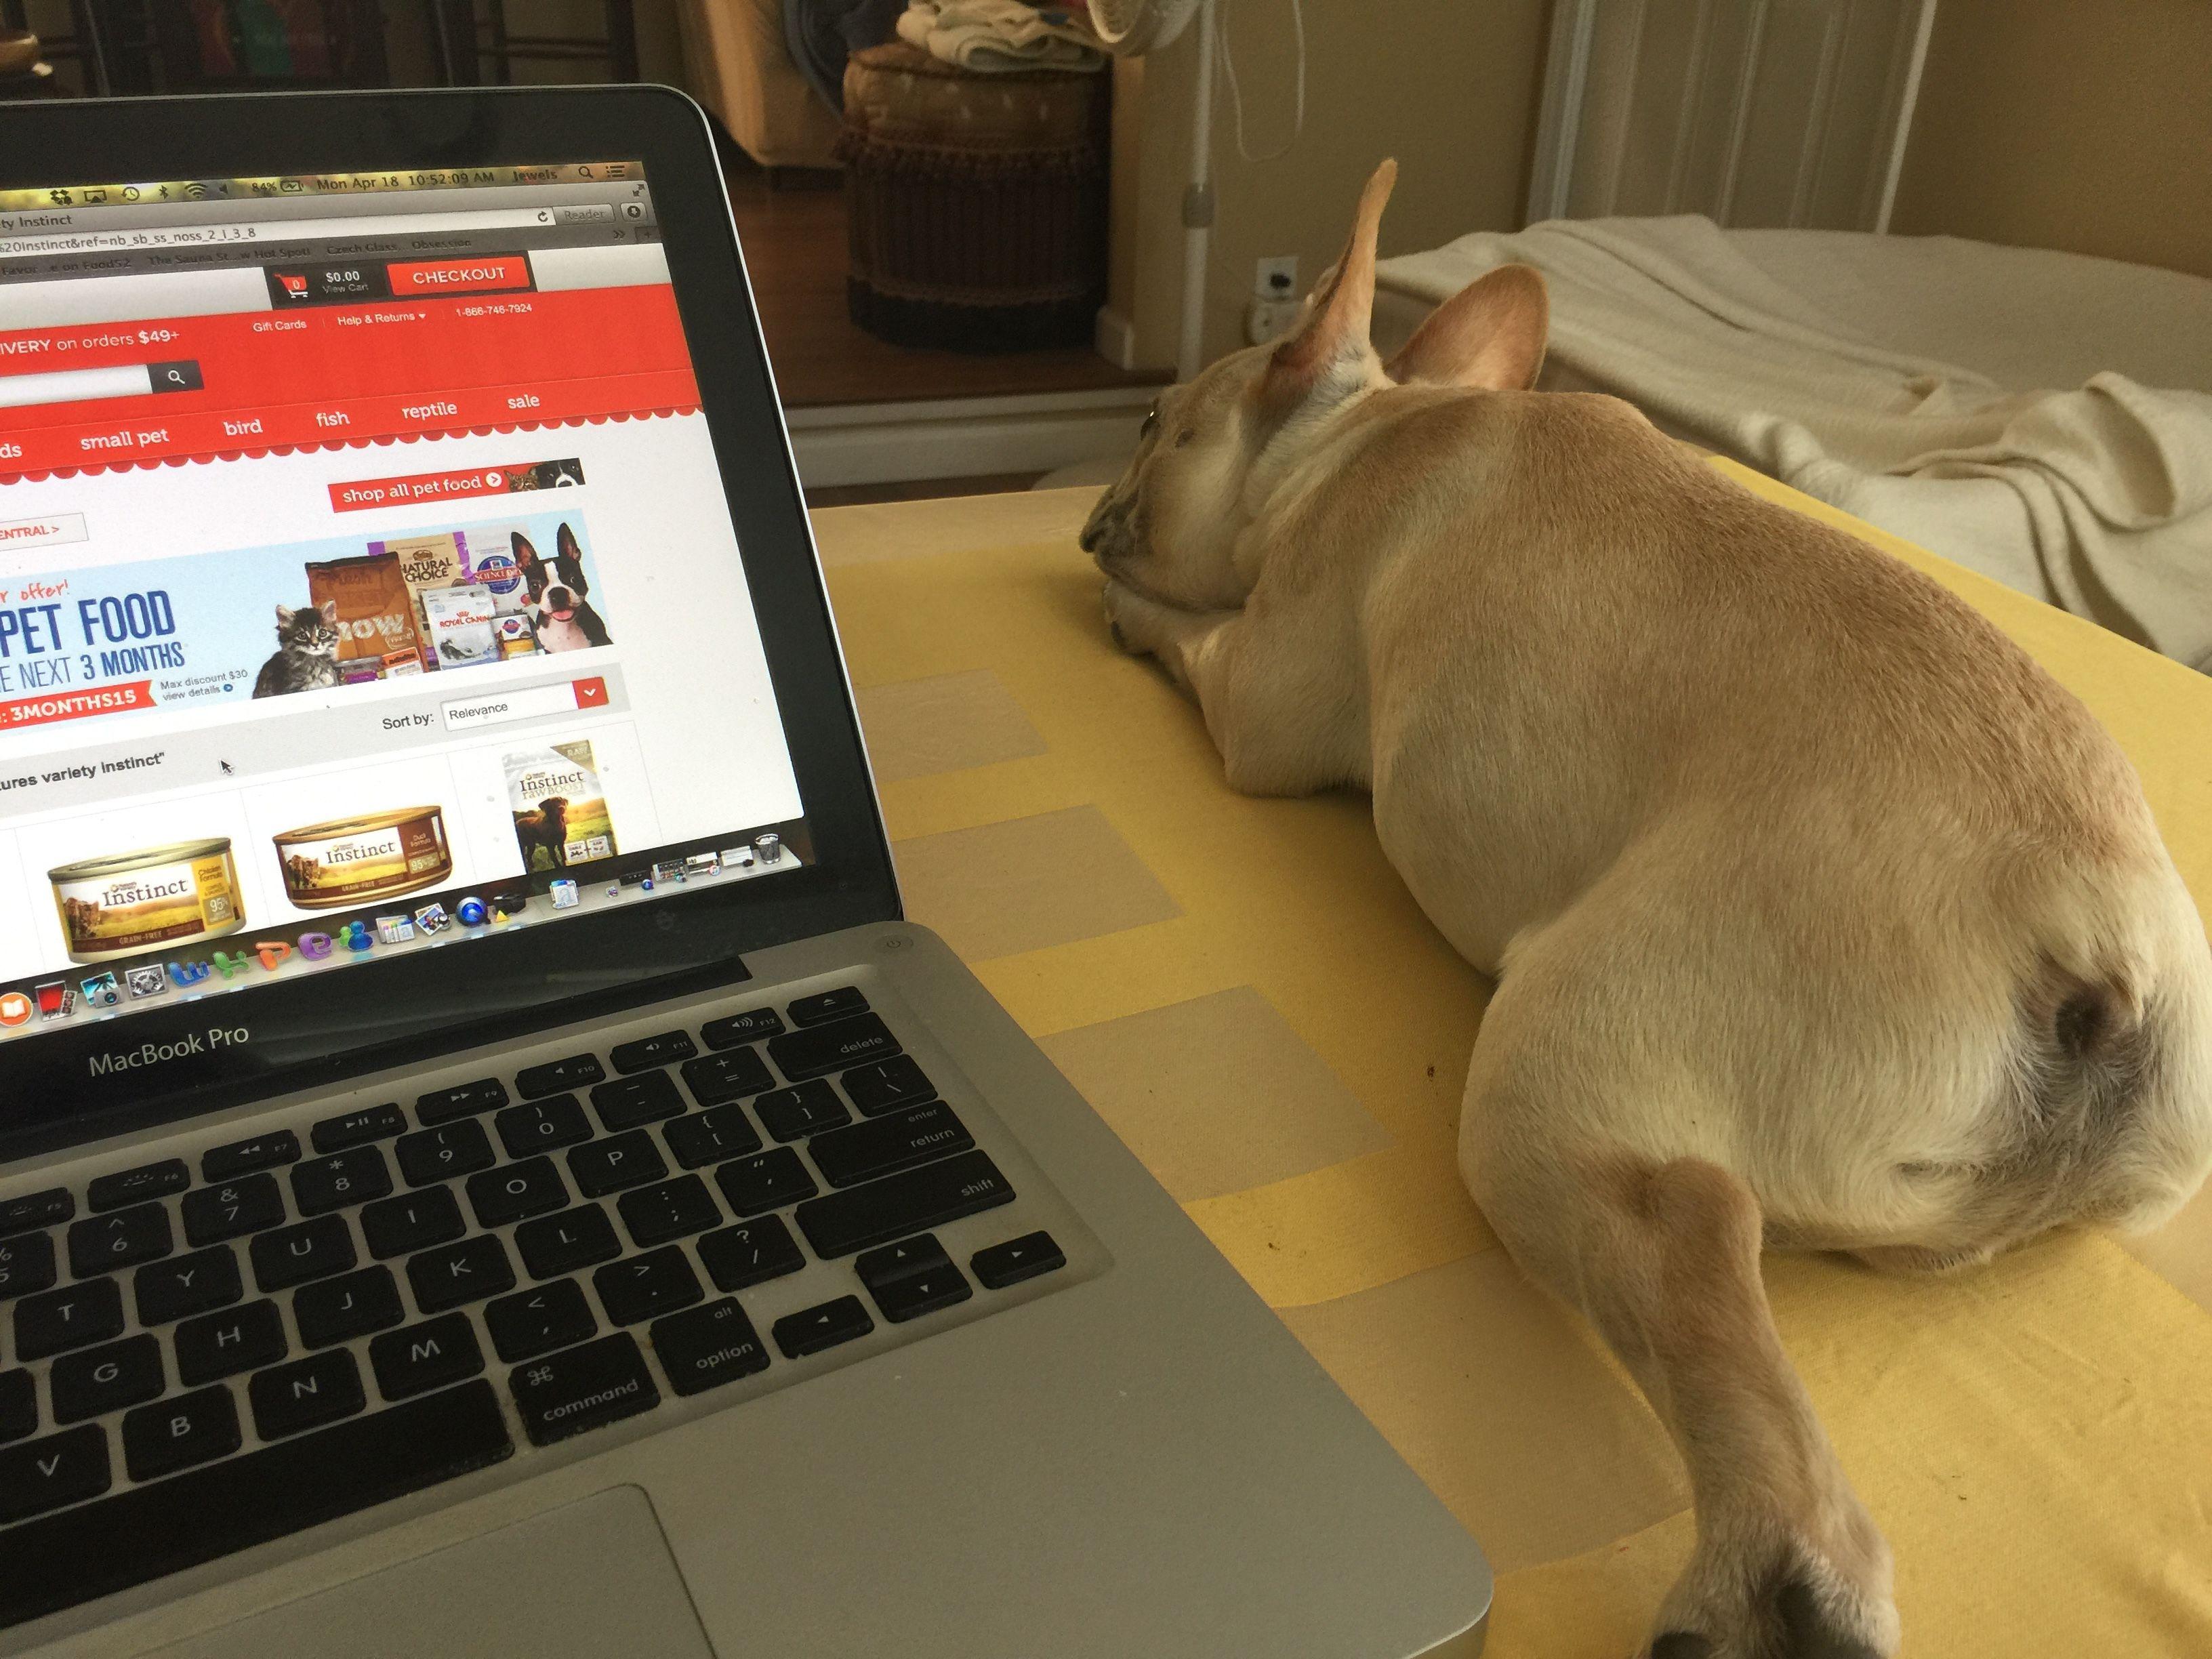 Brando Sleeping On My Desk While I Cruise The Internet